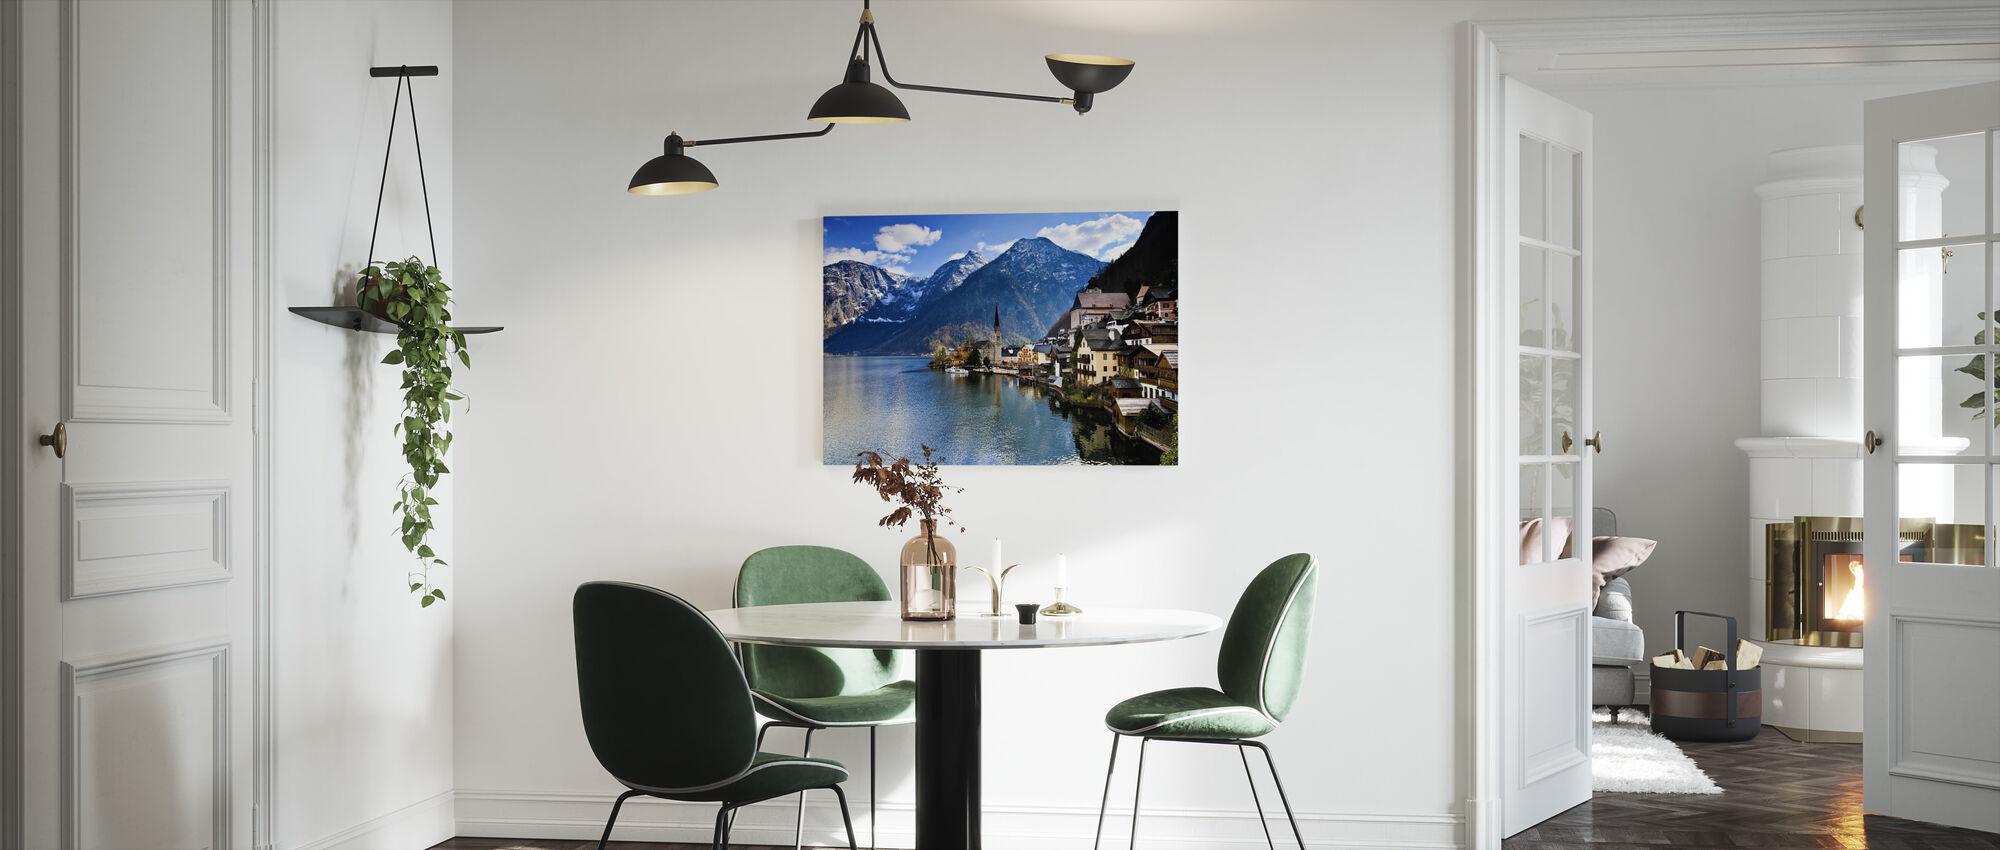 Liten österrikisk bergsby - Canvastavla - Kök